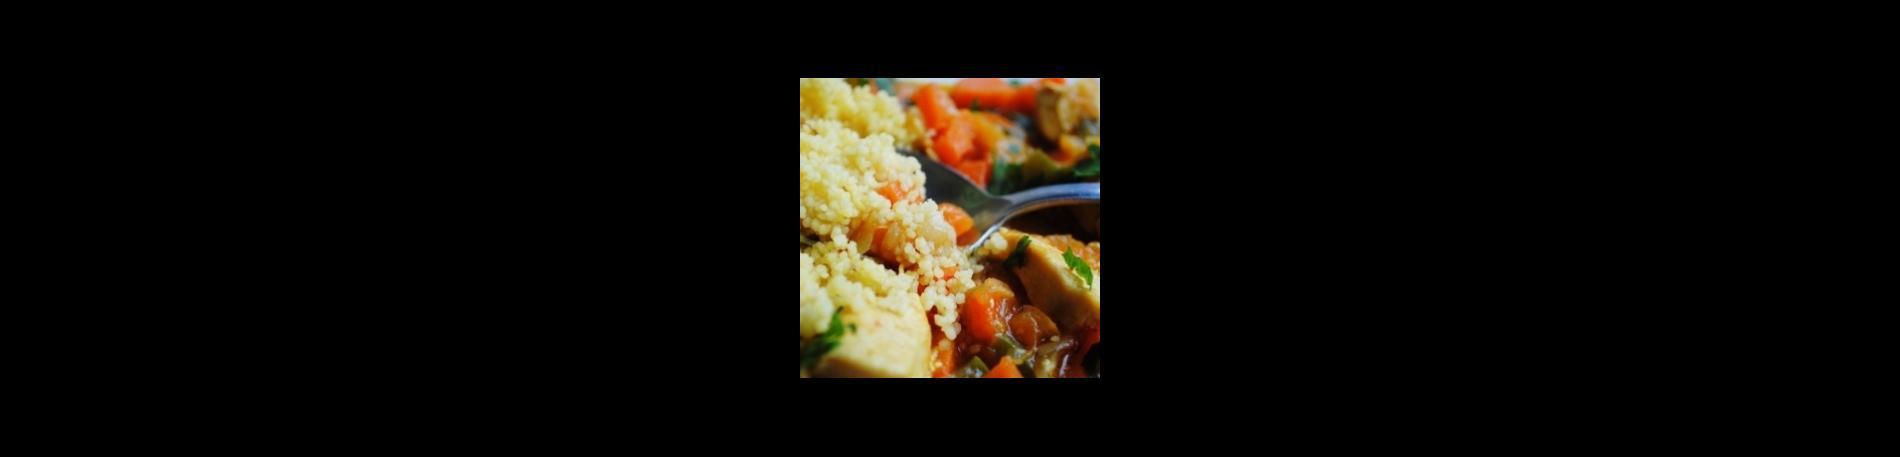 Pollo al curry con Couscous